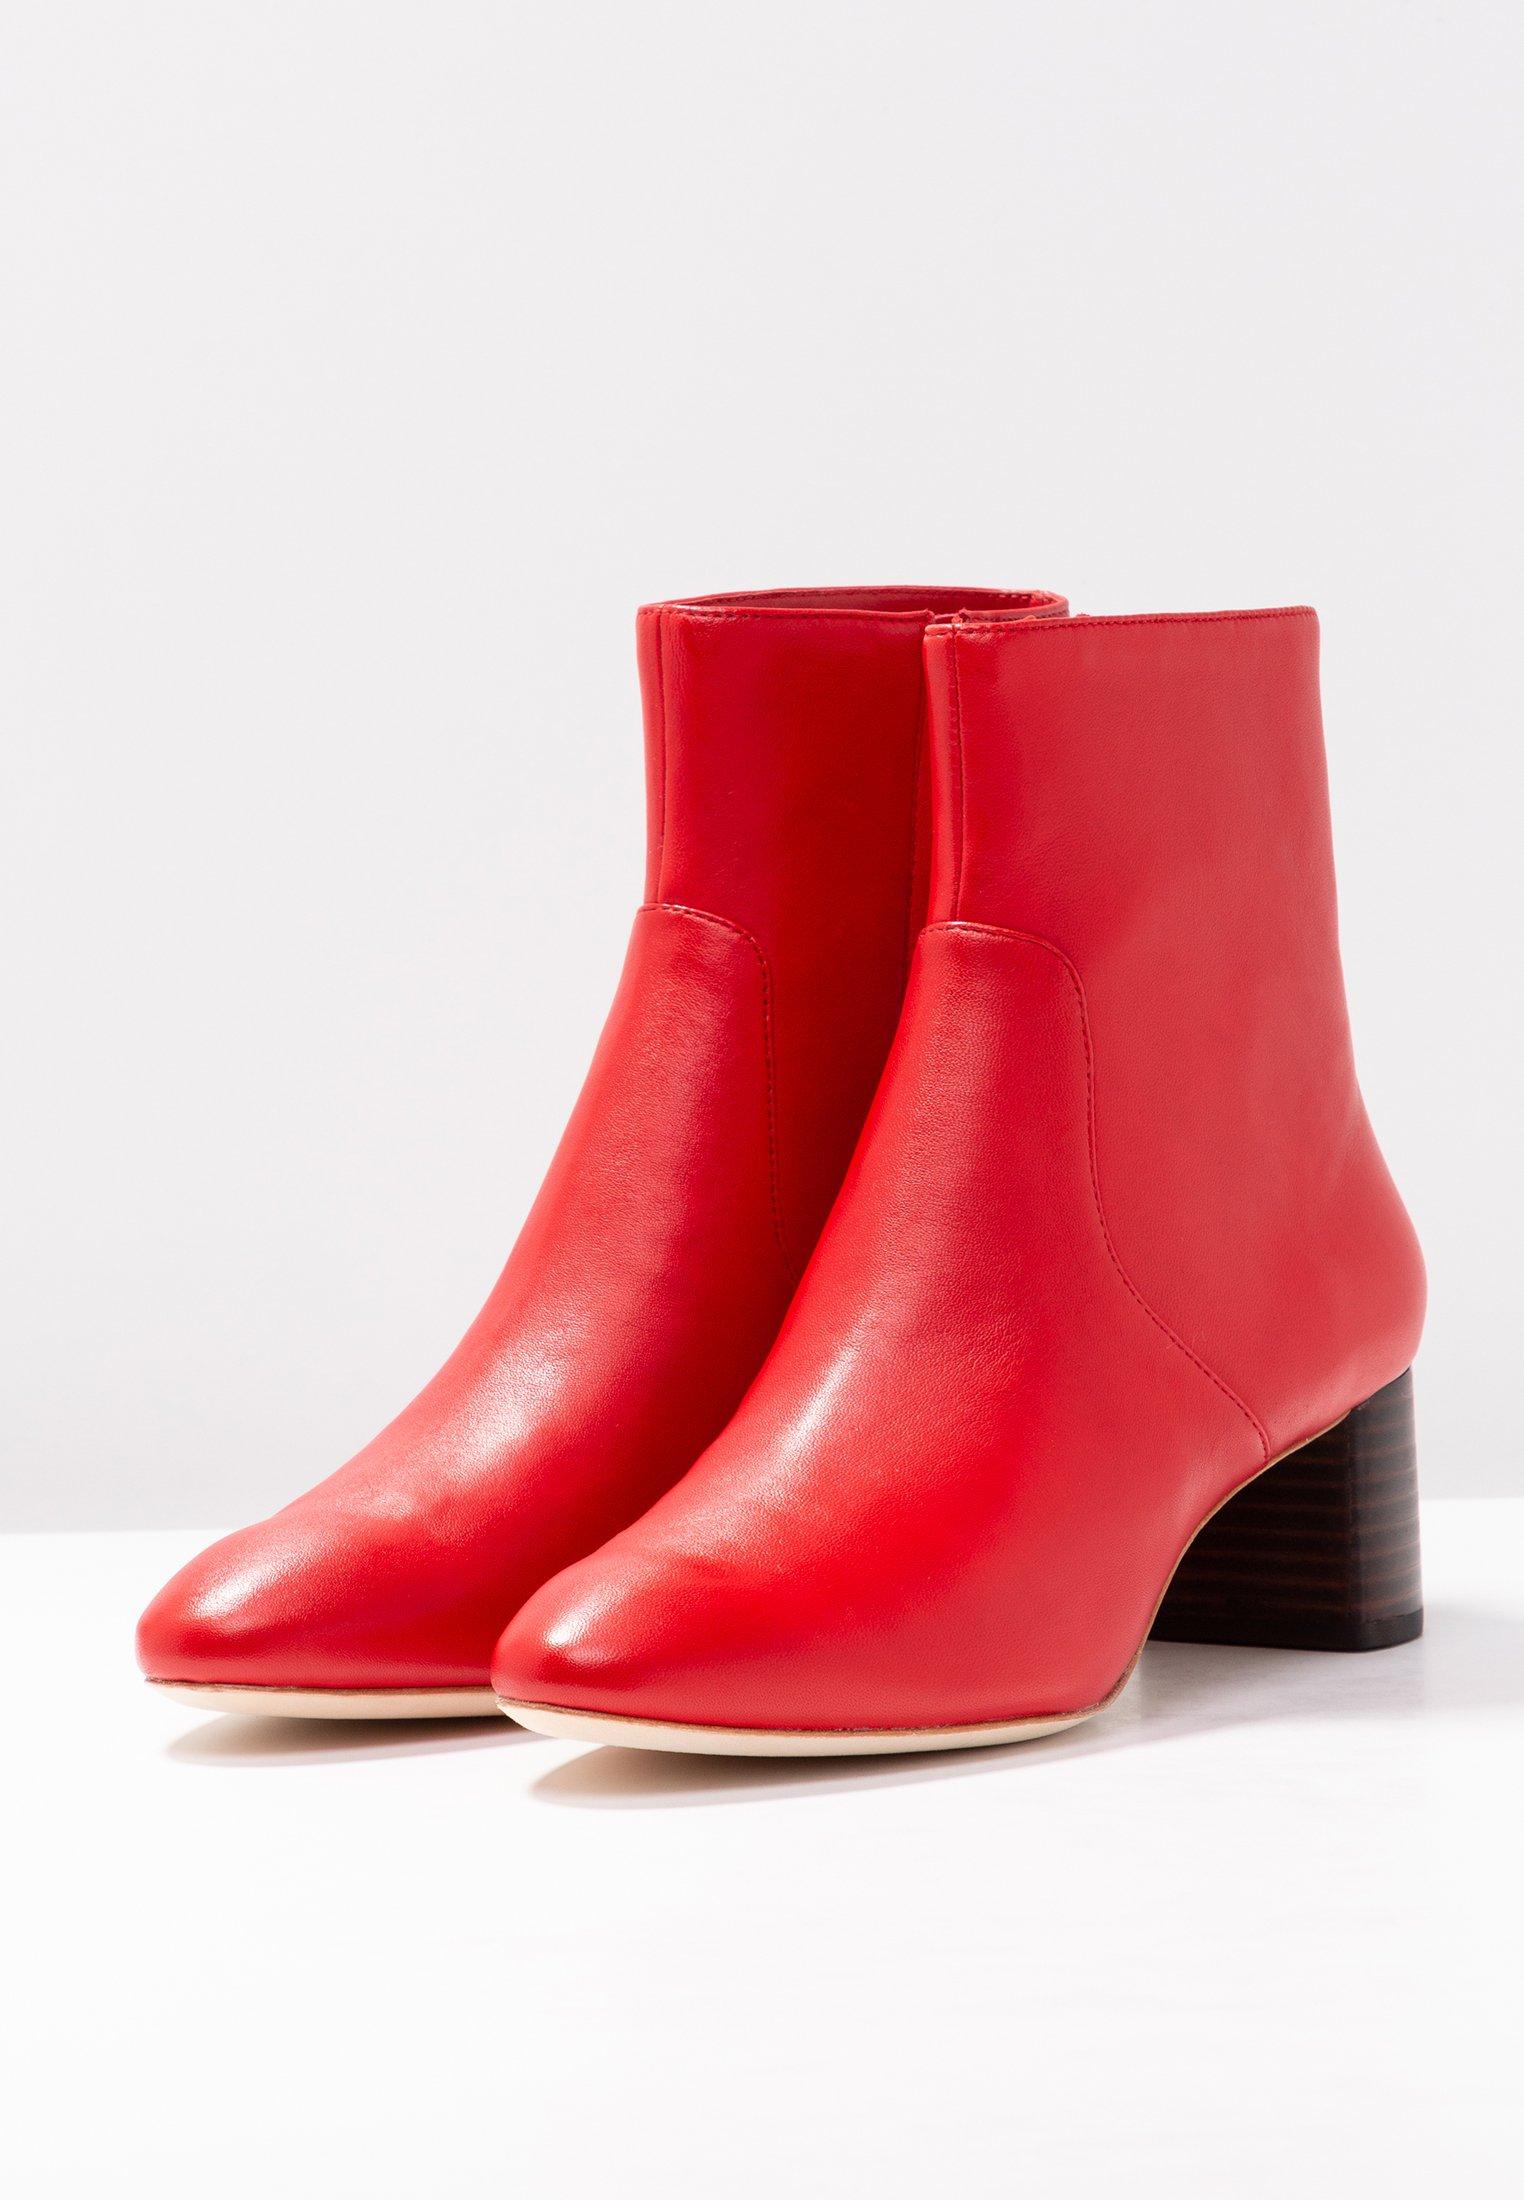 Gema BootBottines Mid Toe Randall Cherry Loeffler Red Almond Heel e2bEI9YWDH